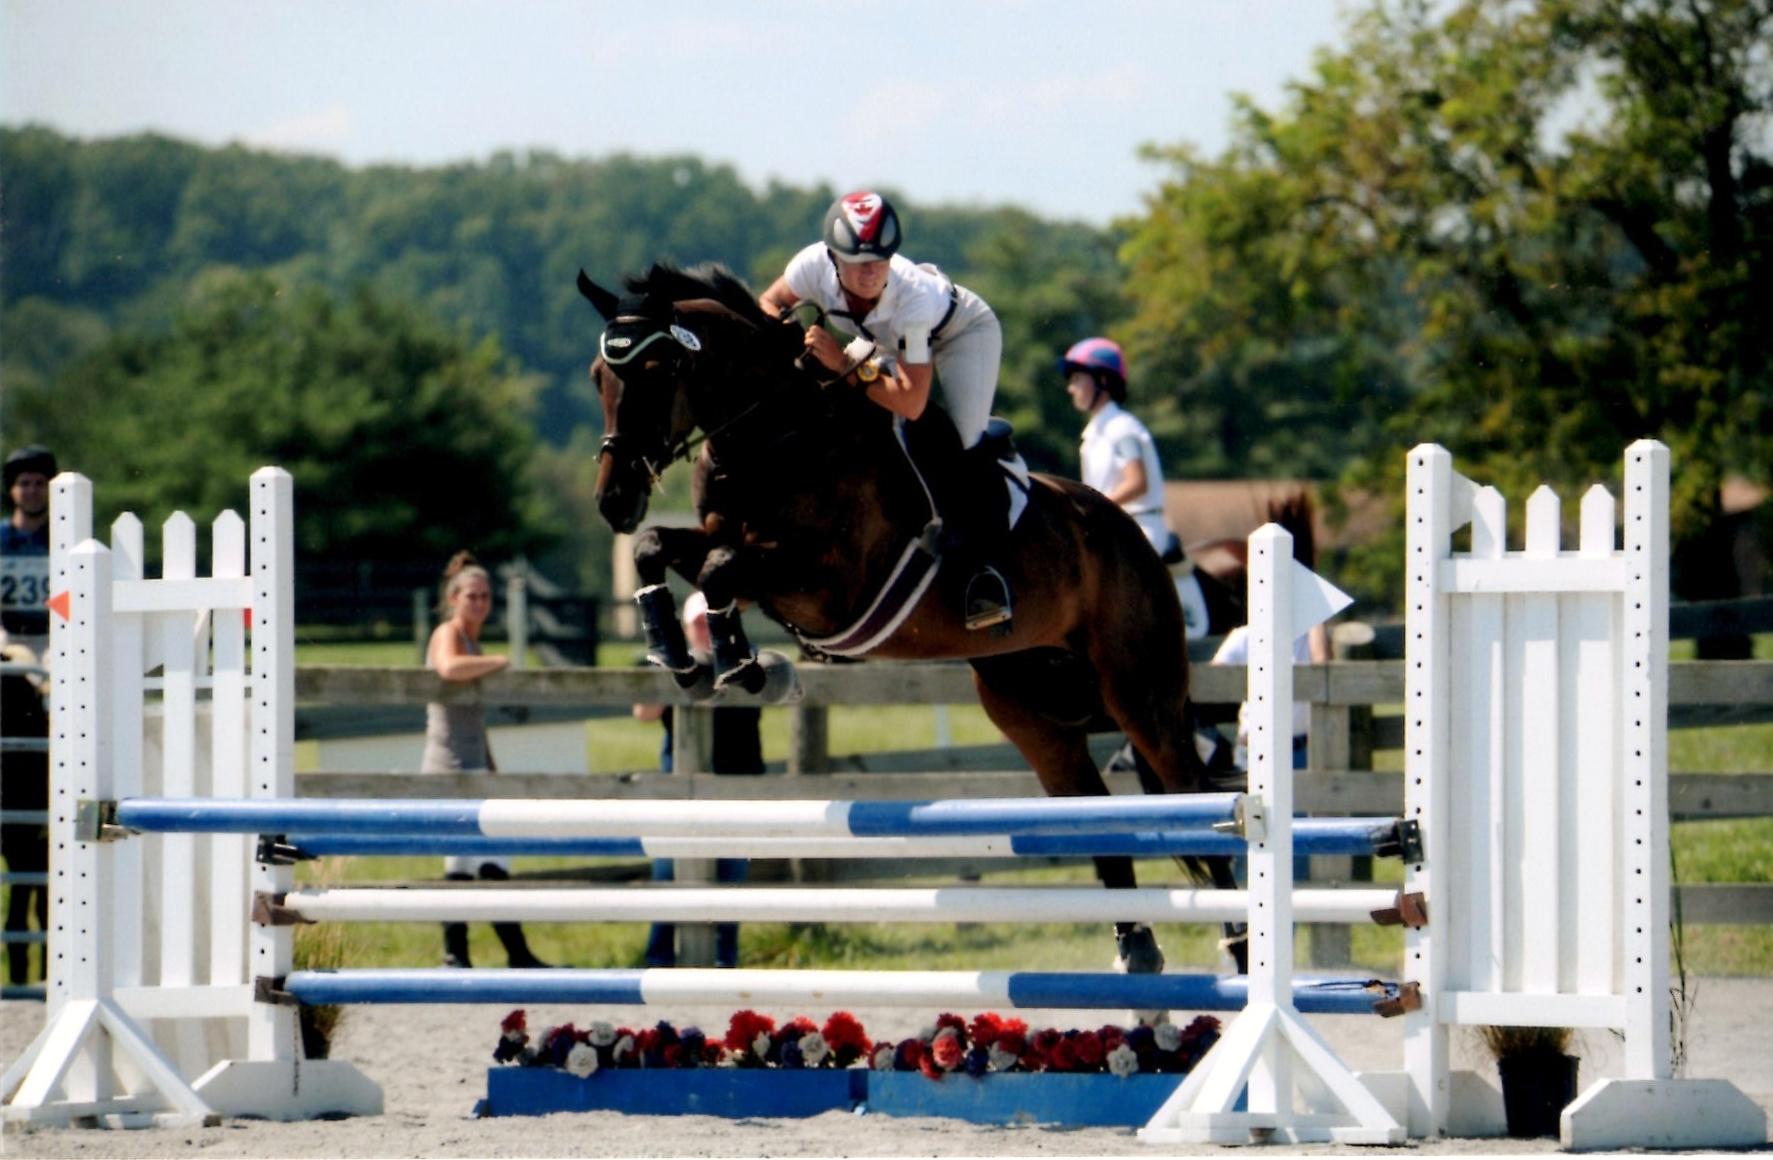 Horses Of Srb Equestrian Srb Equestrian Sports